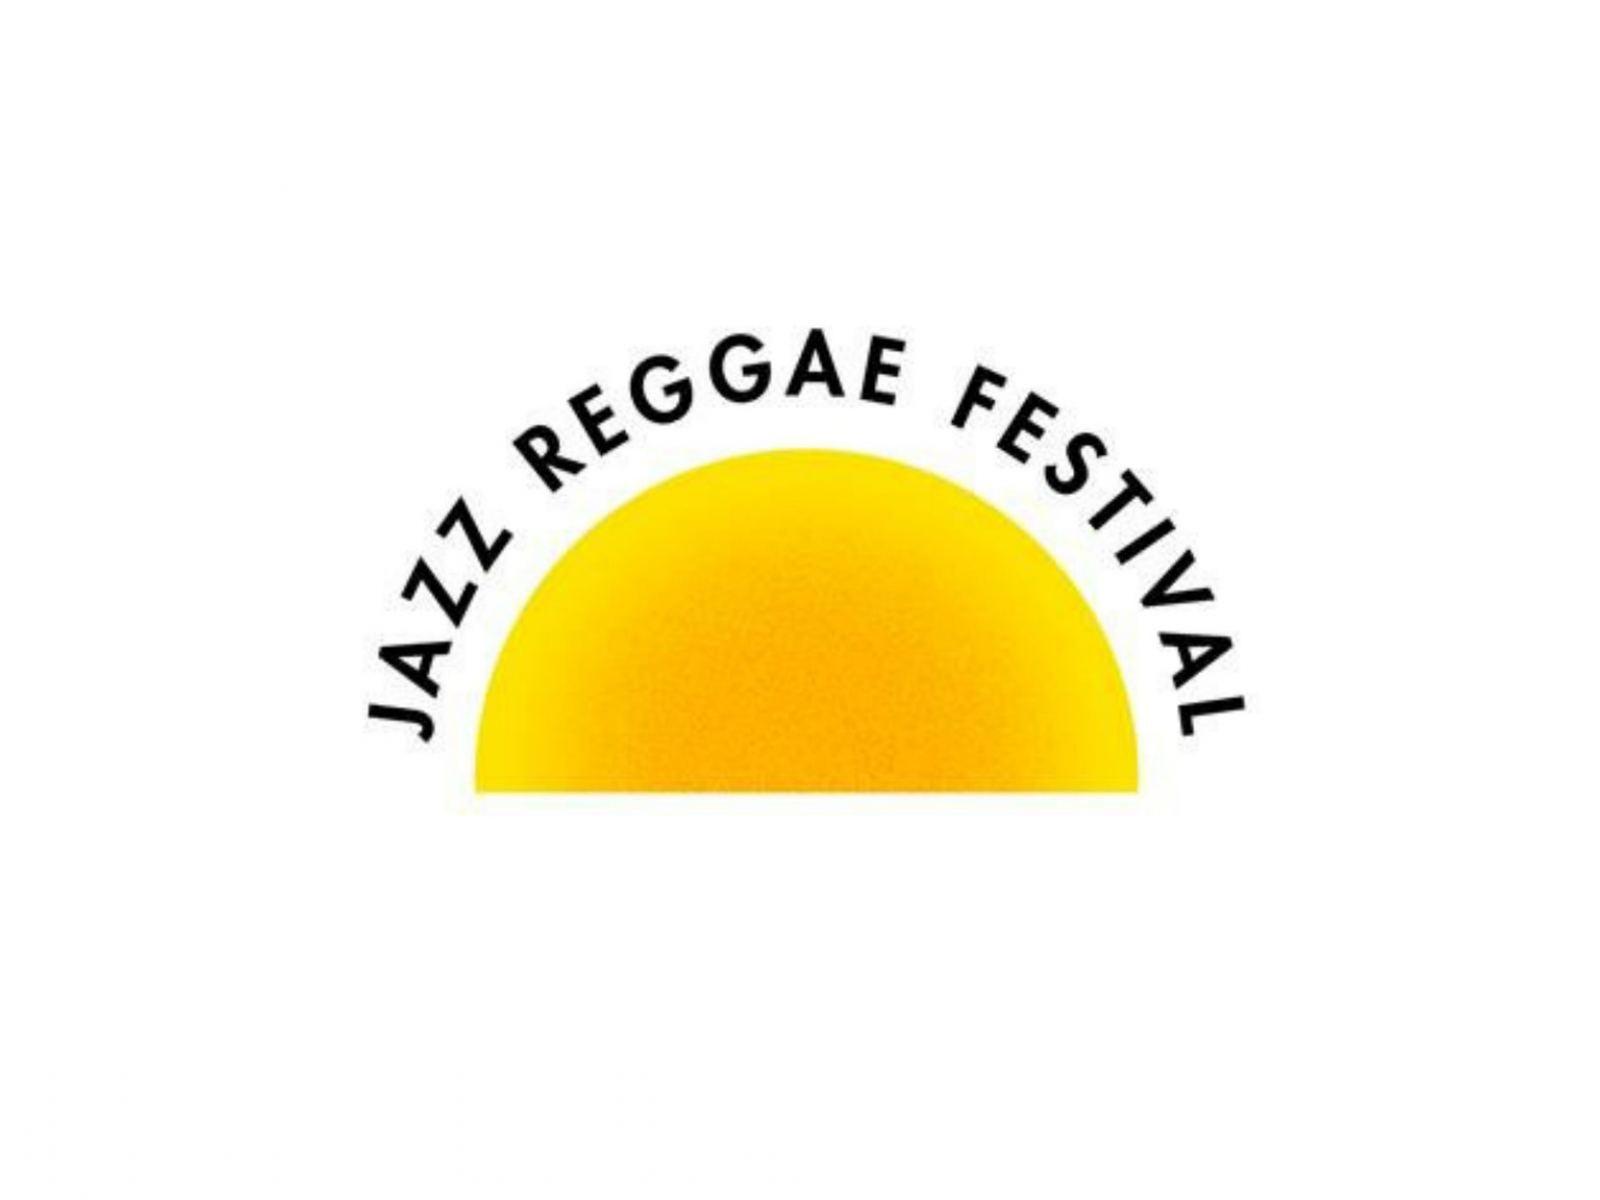 Main image for event titled 2019 JazzReggae Fest